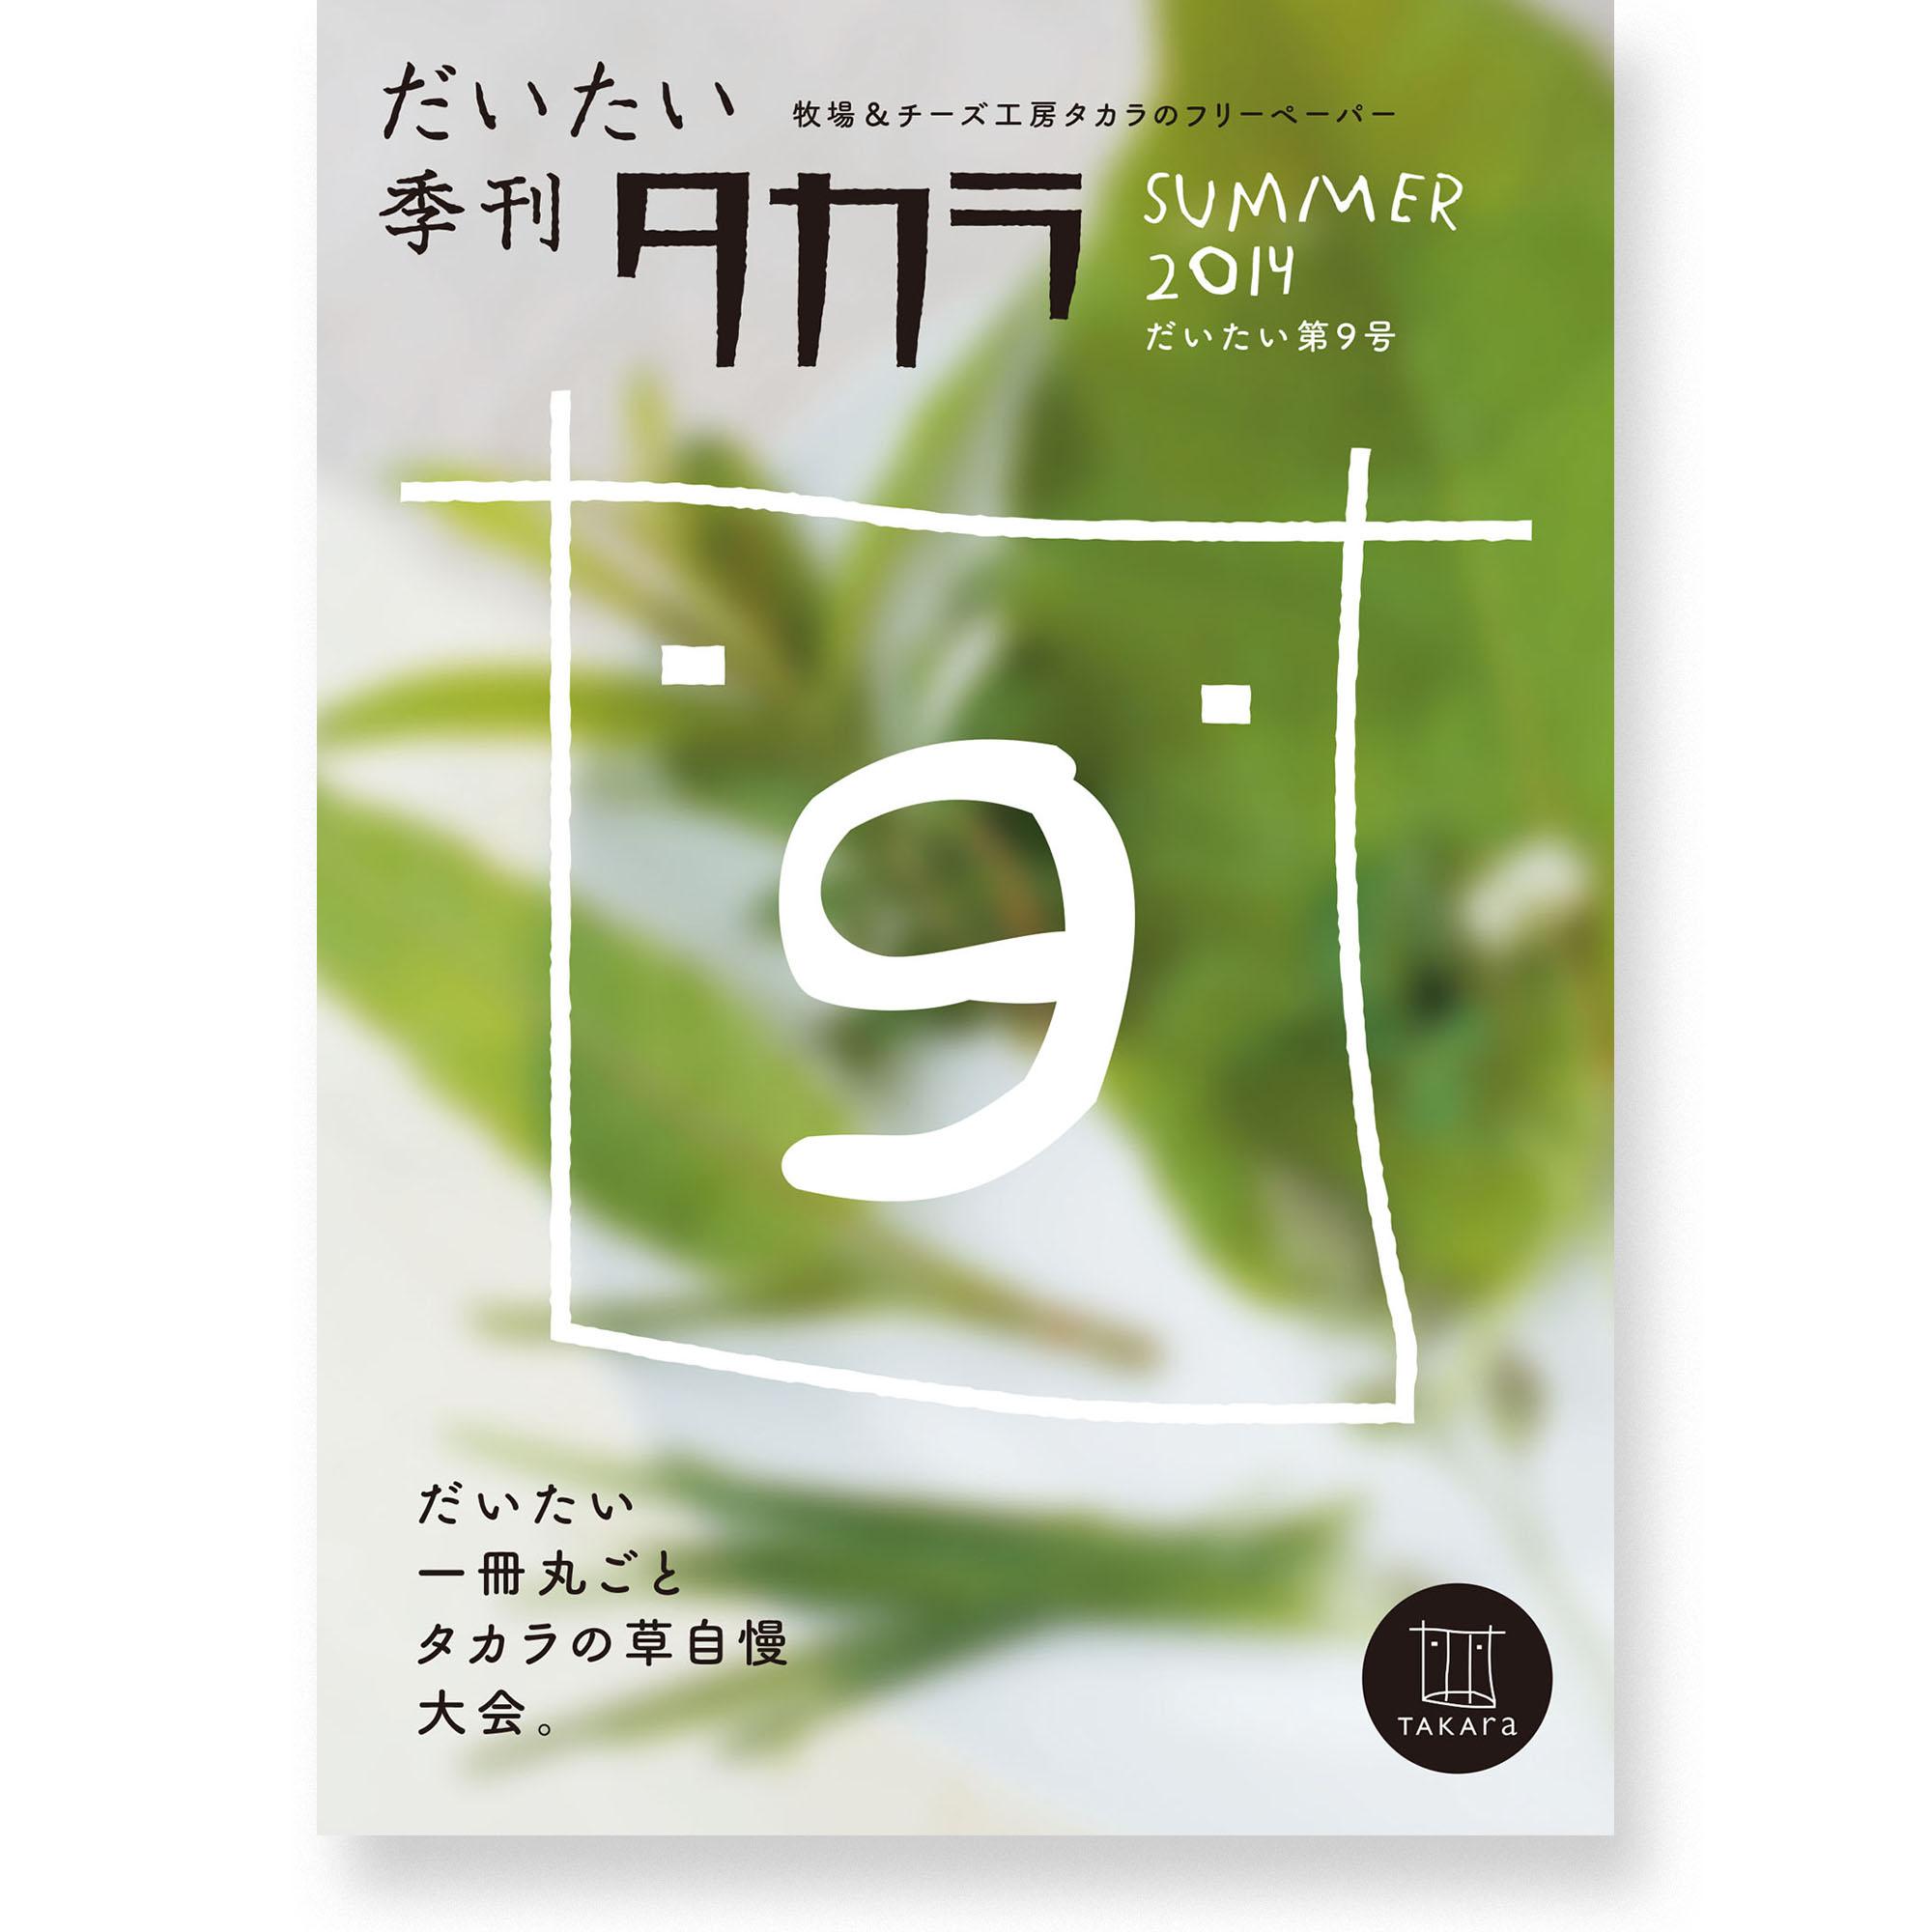 Daitai Quarterly Takara Vol.9